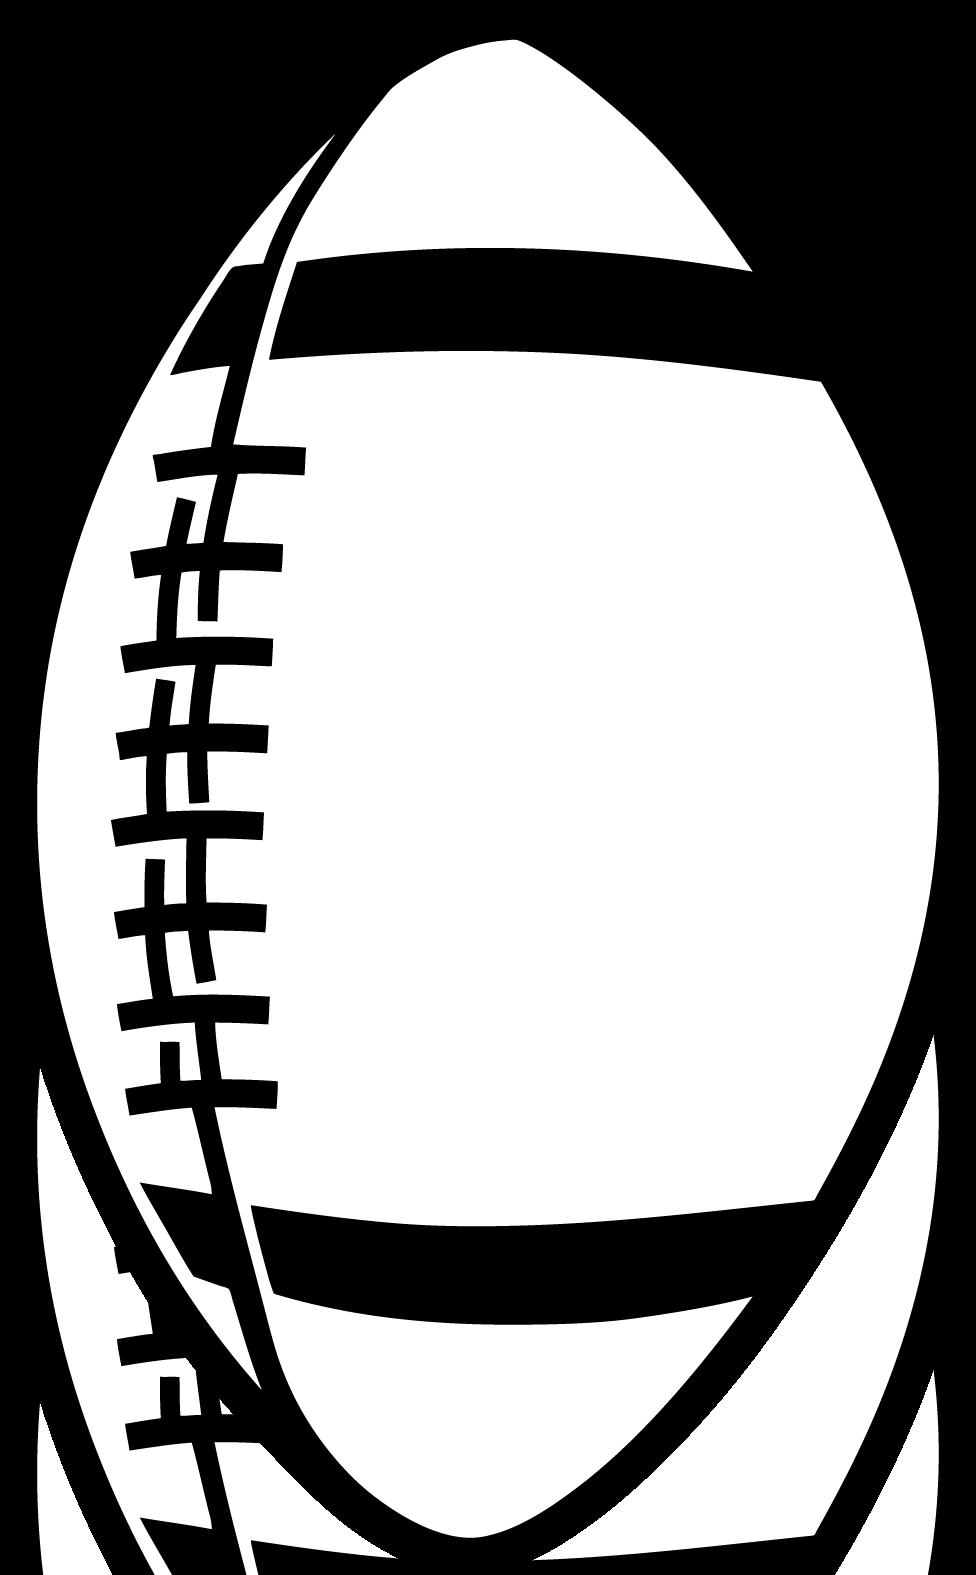 Football Clip & Football Clip Clip Art Images.